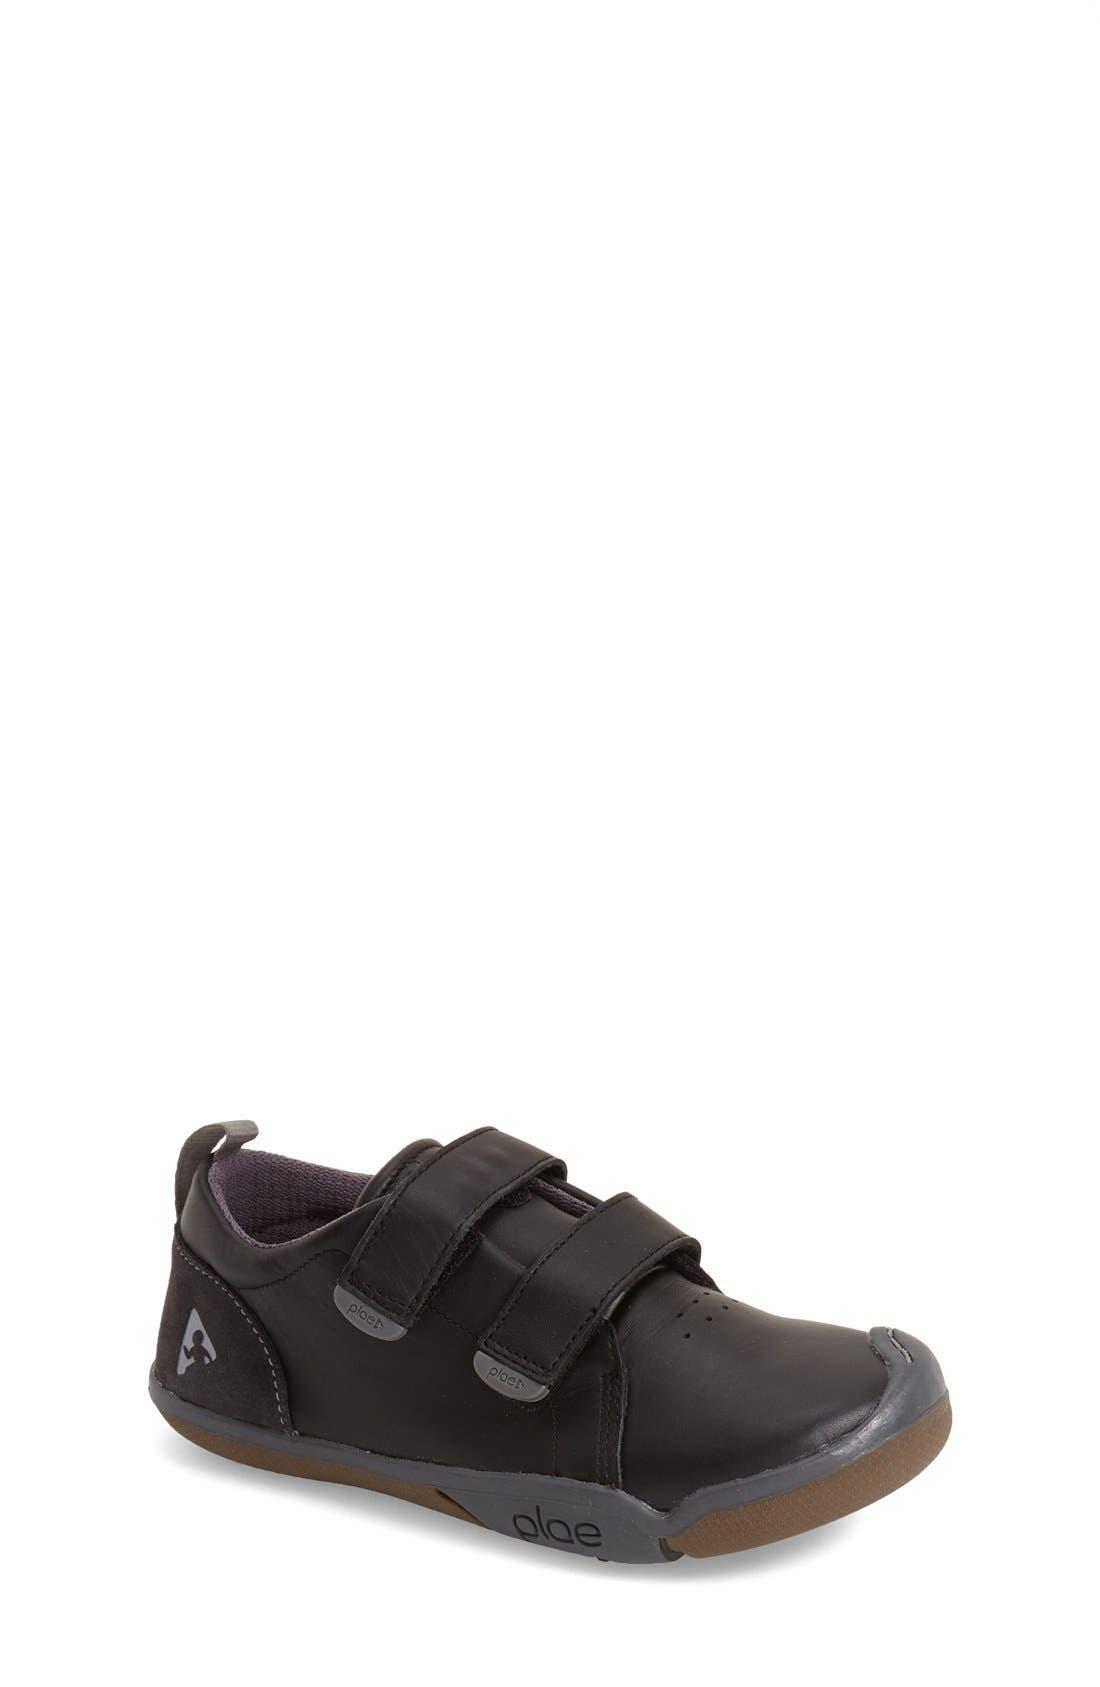 PLAE 'Roan' Customizable Leather Sneaker